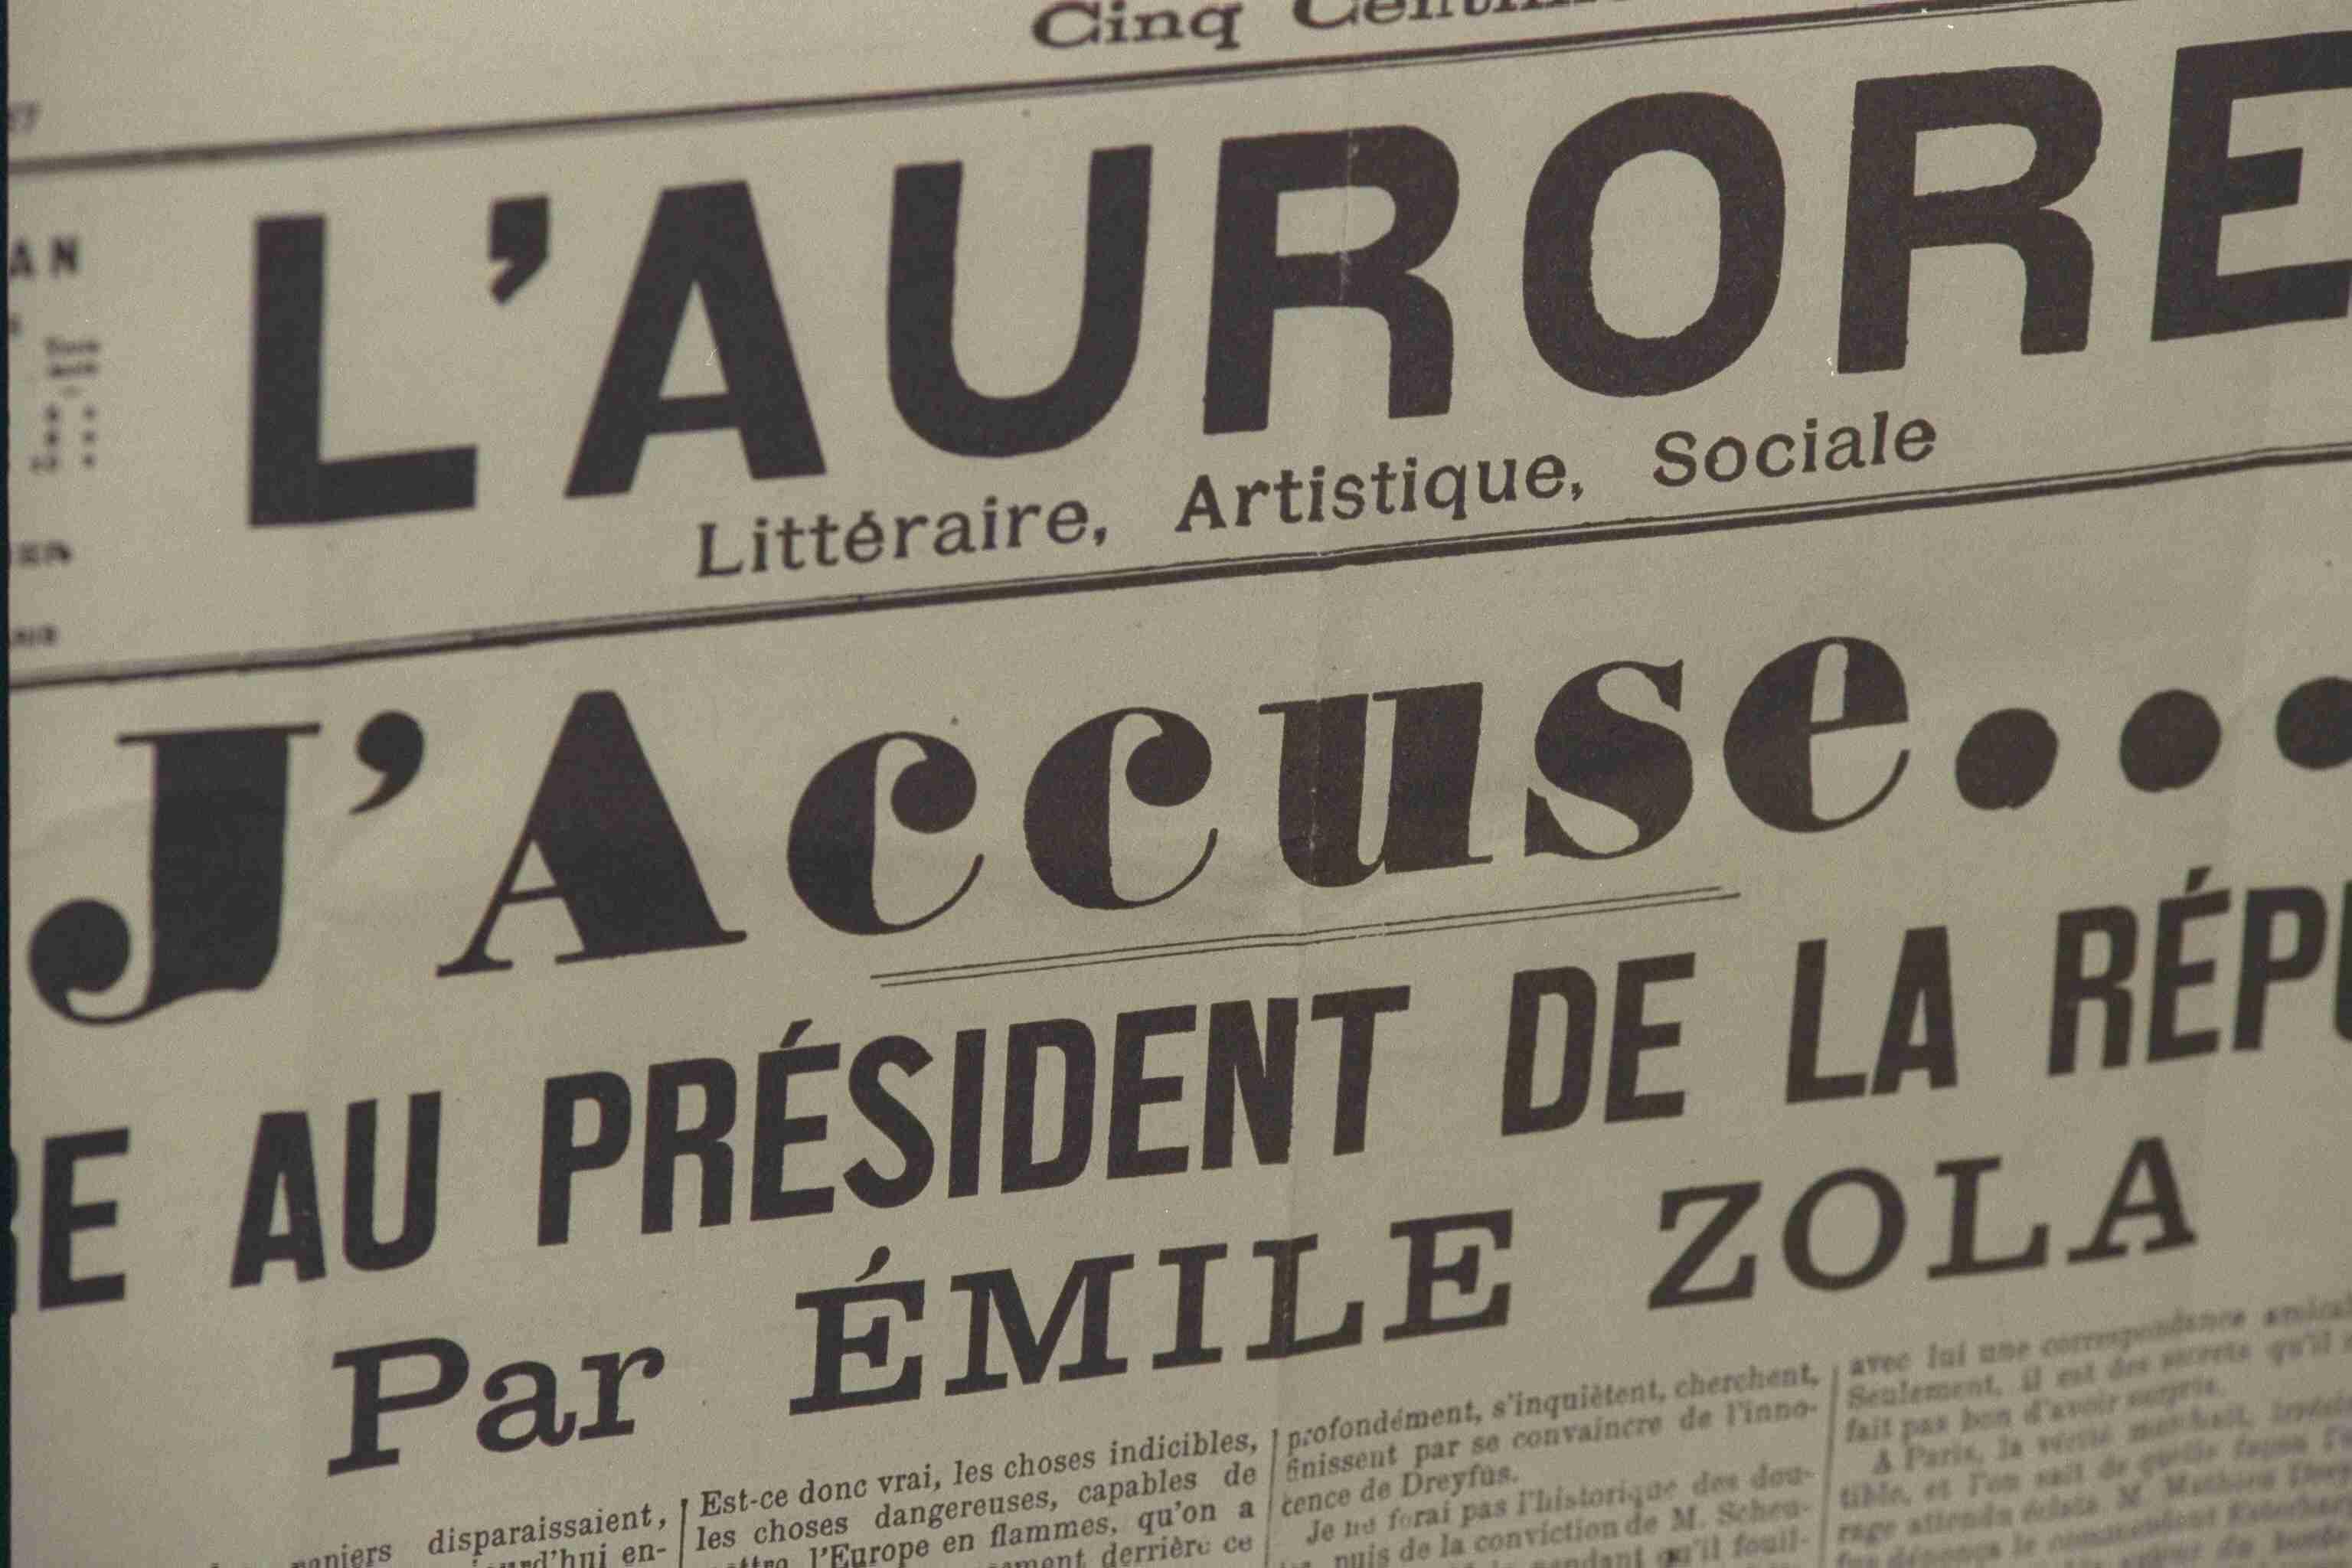 DREYFUS AFFAIR : 'J'ACCUSE?!' BY EMILE ZOLA